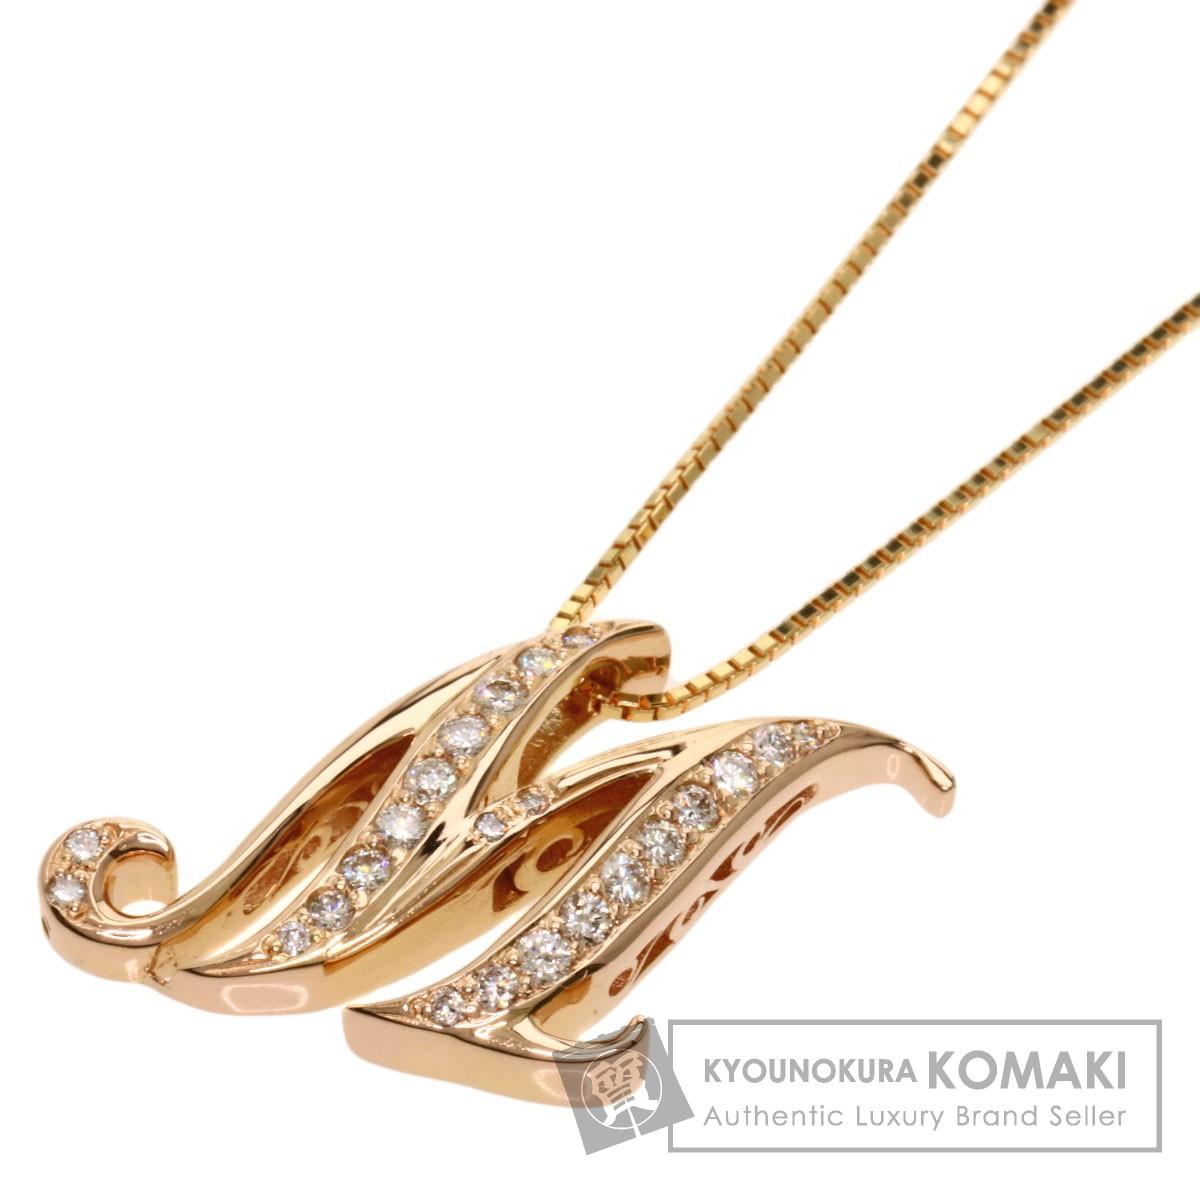 0.4ct ダイヤモンド イニシャル M ネックレス K18ピンクゴールド/K18YG 8.5g レディース 【中古】